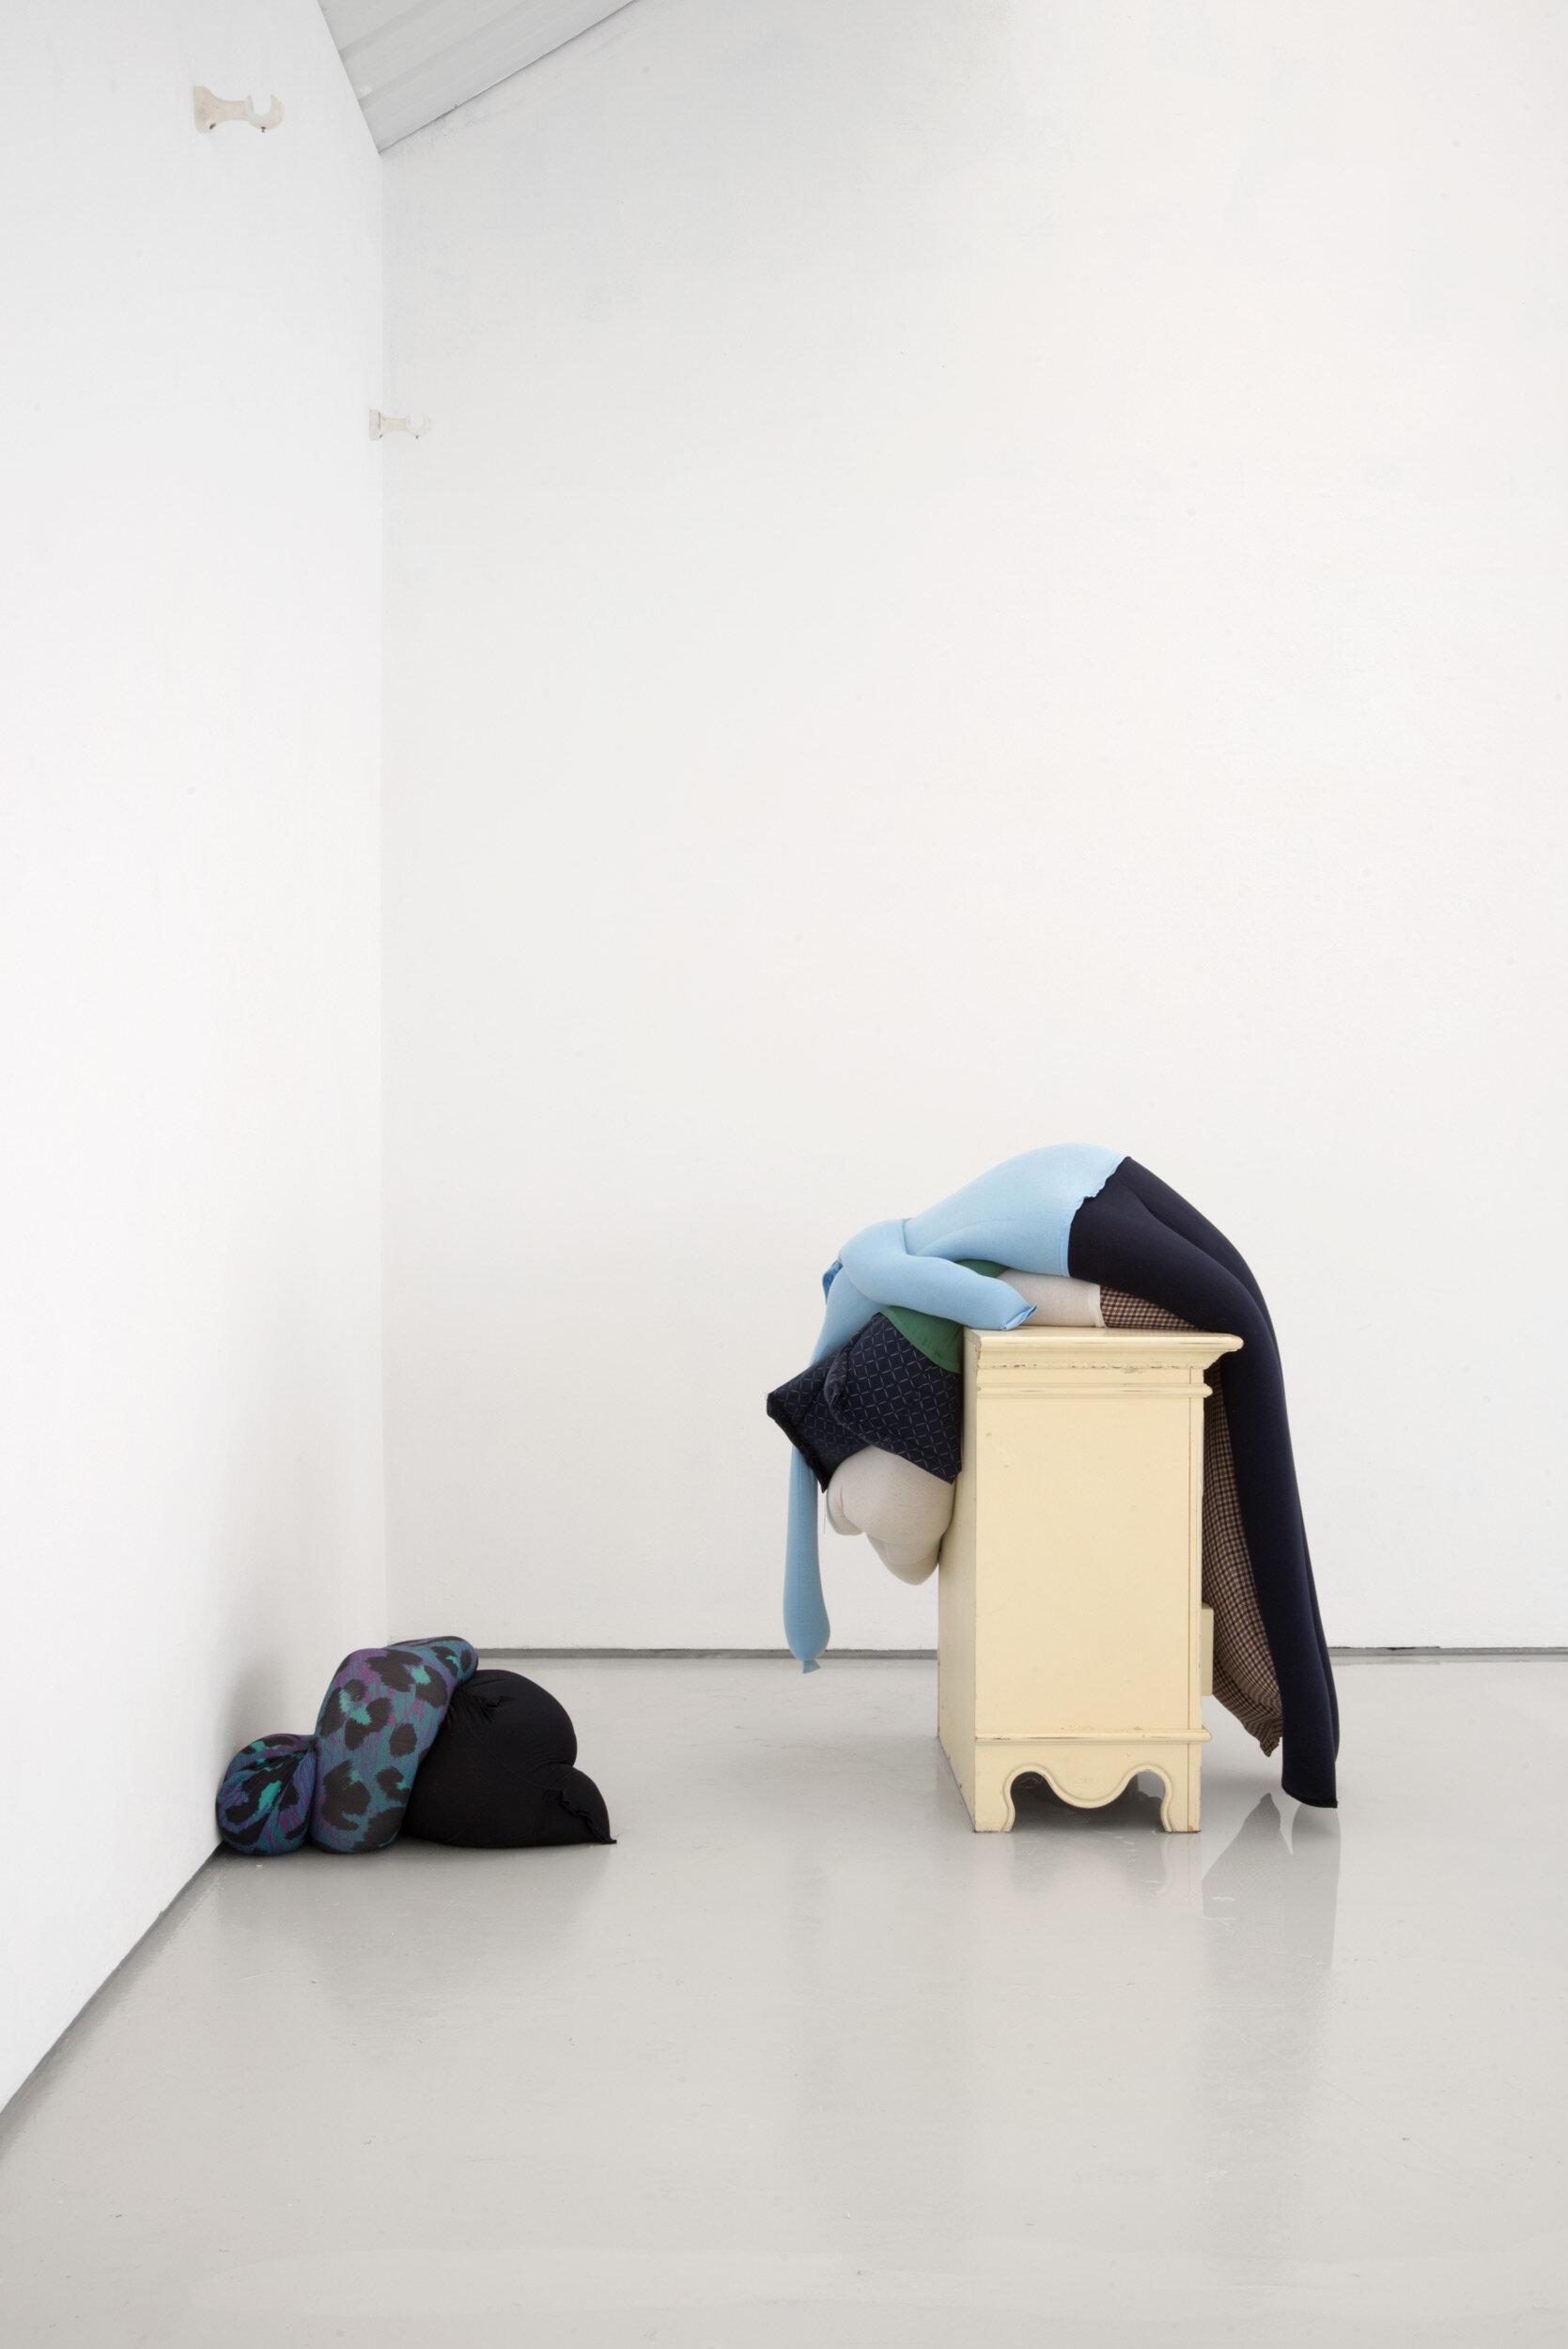 Fall, slump, drop on a bedside cabinet in water[...], Installation View, Alex Farrar, Bloc Projects, 2019, 8.jpg